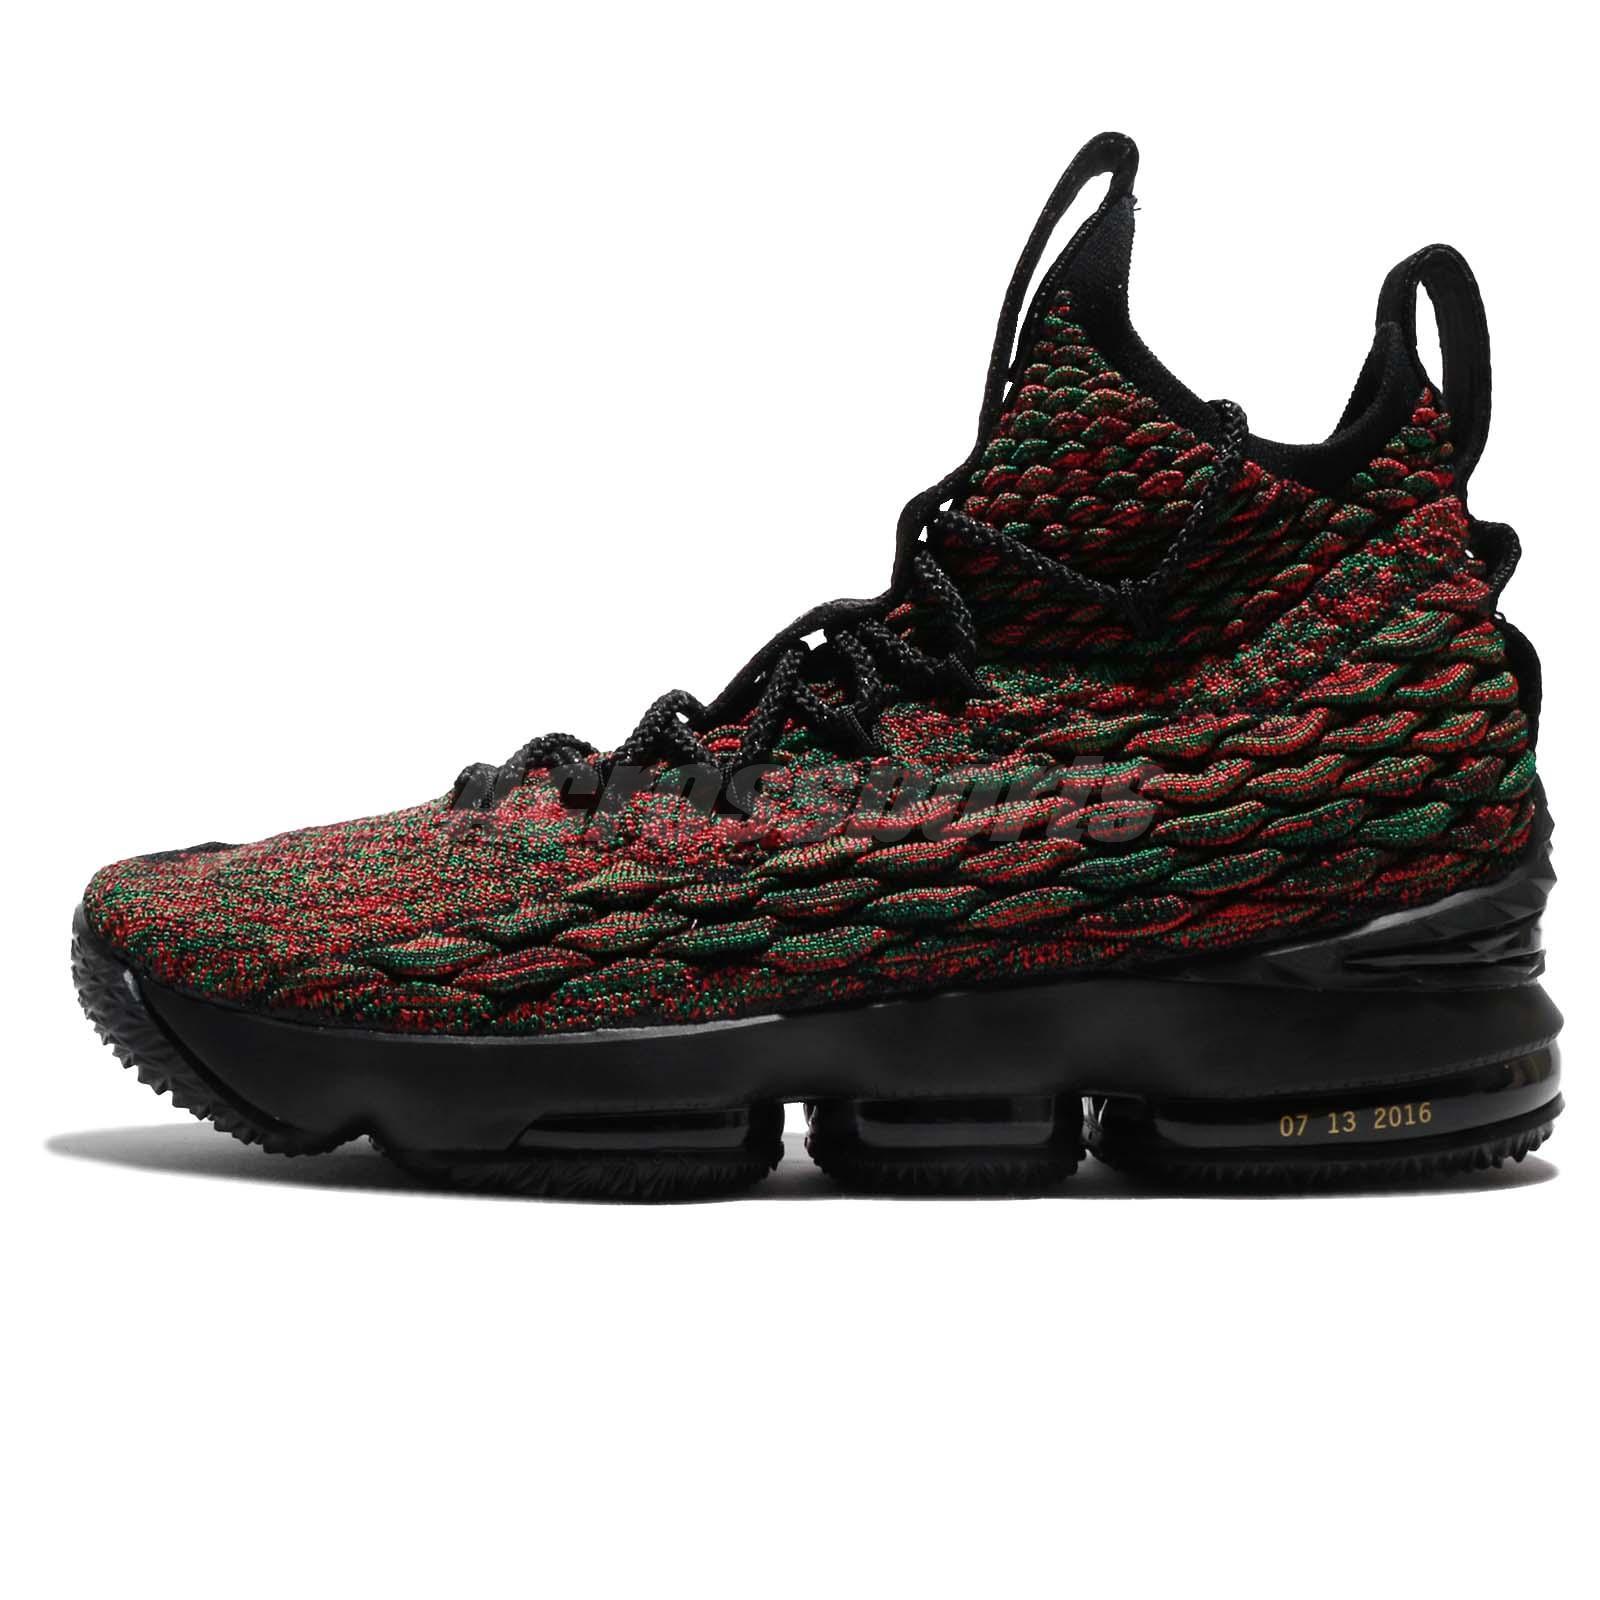 9775a55759e 40973 24c4b  where to buy nike lebron xv lmtd ep james 15 bhm black mens  basketball shoes aa3857